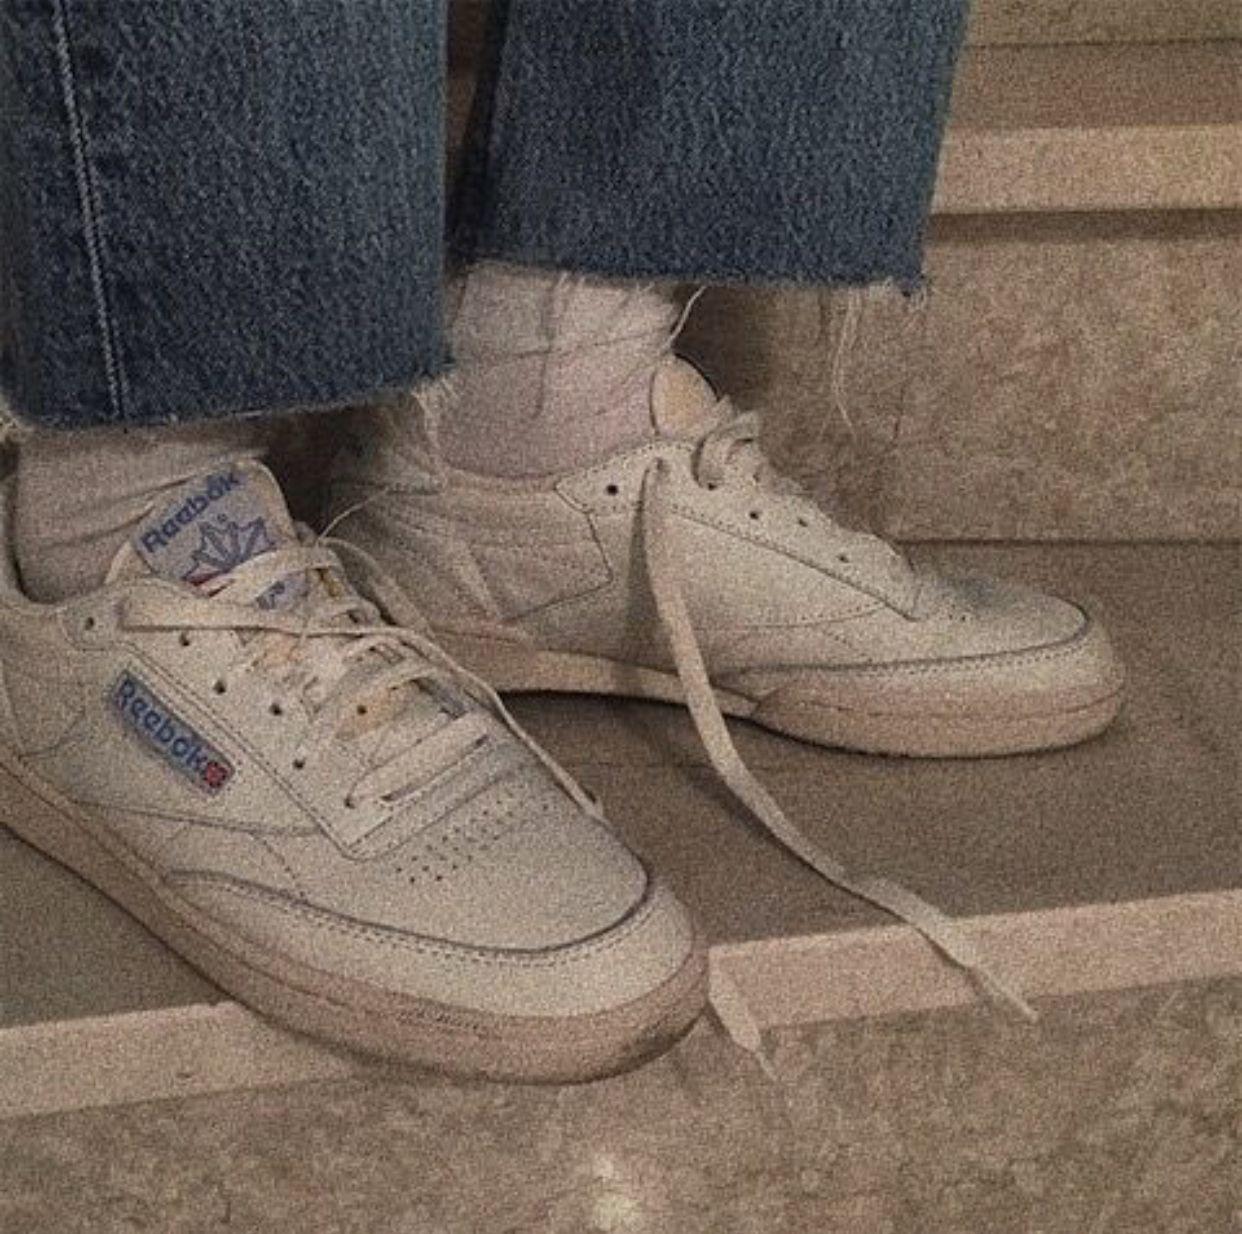 Vintage Reeboks | Aesthetic shoes